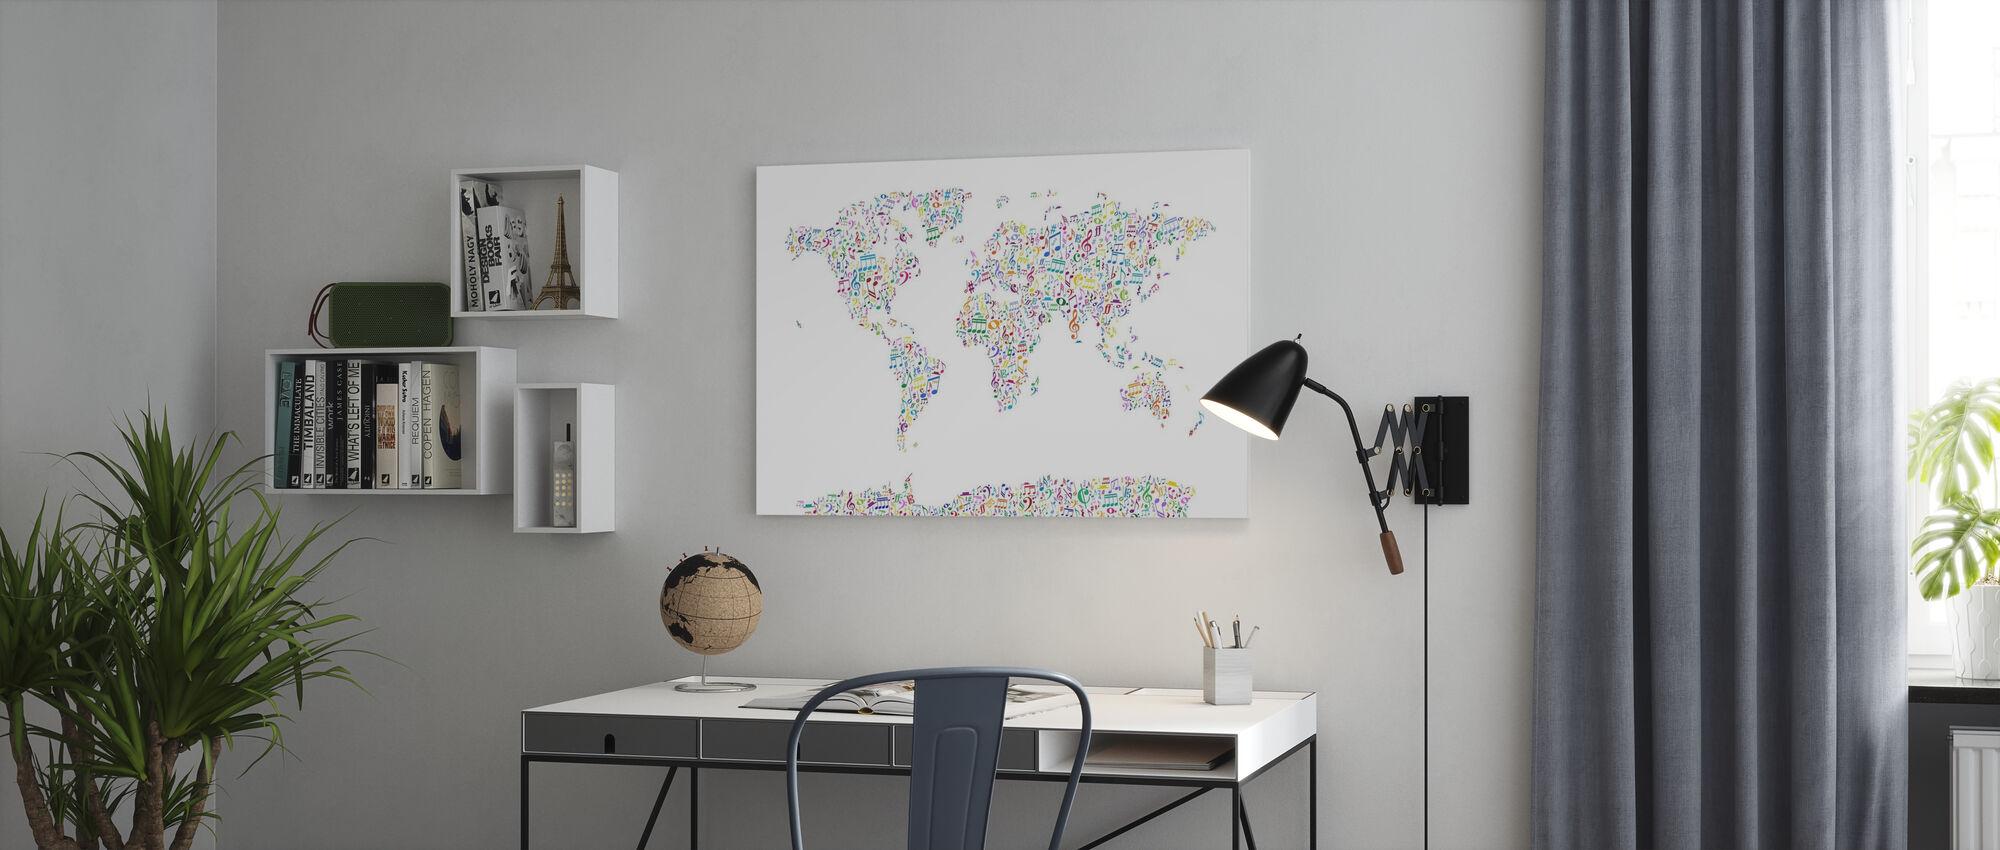 Music Notes Weltkarte Farbe - Leinwandbild - Büro